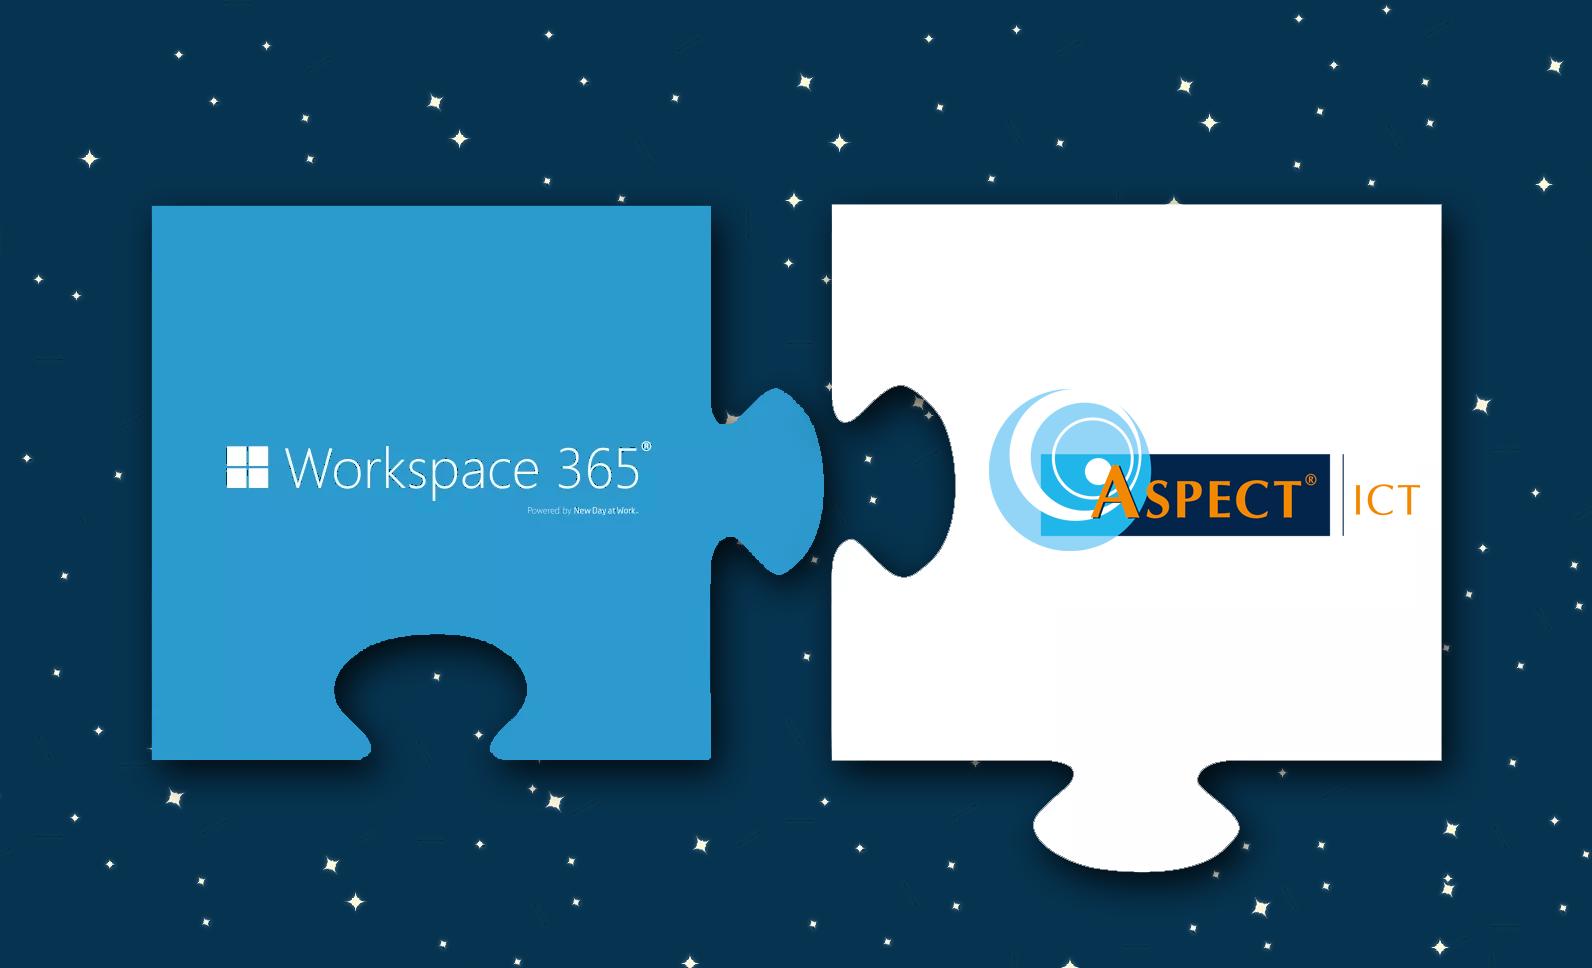 Aspect ICT Workspace 365